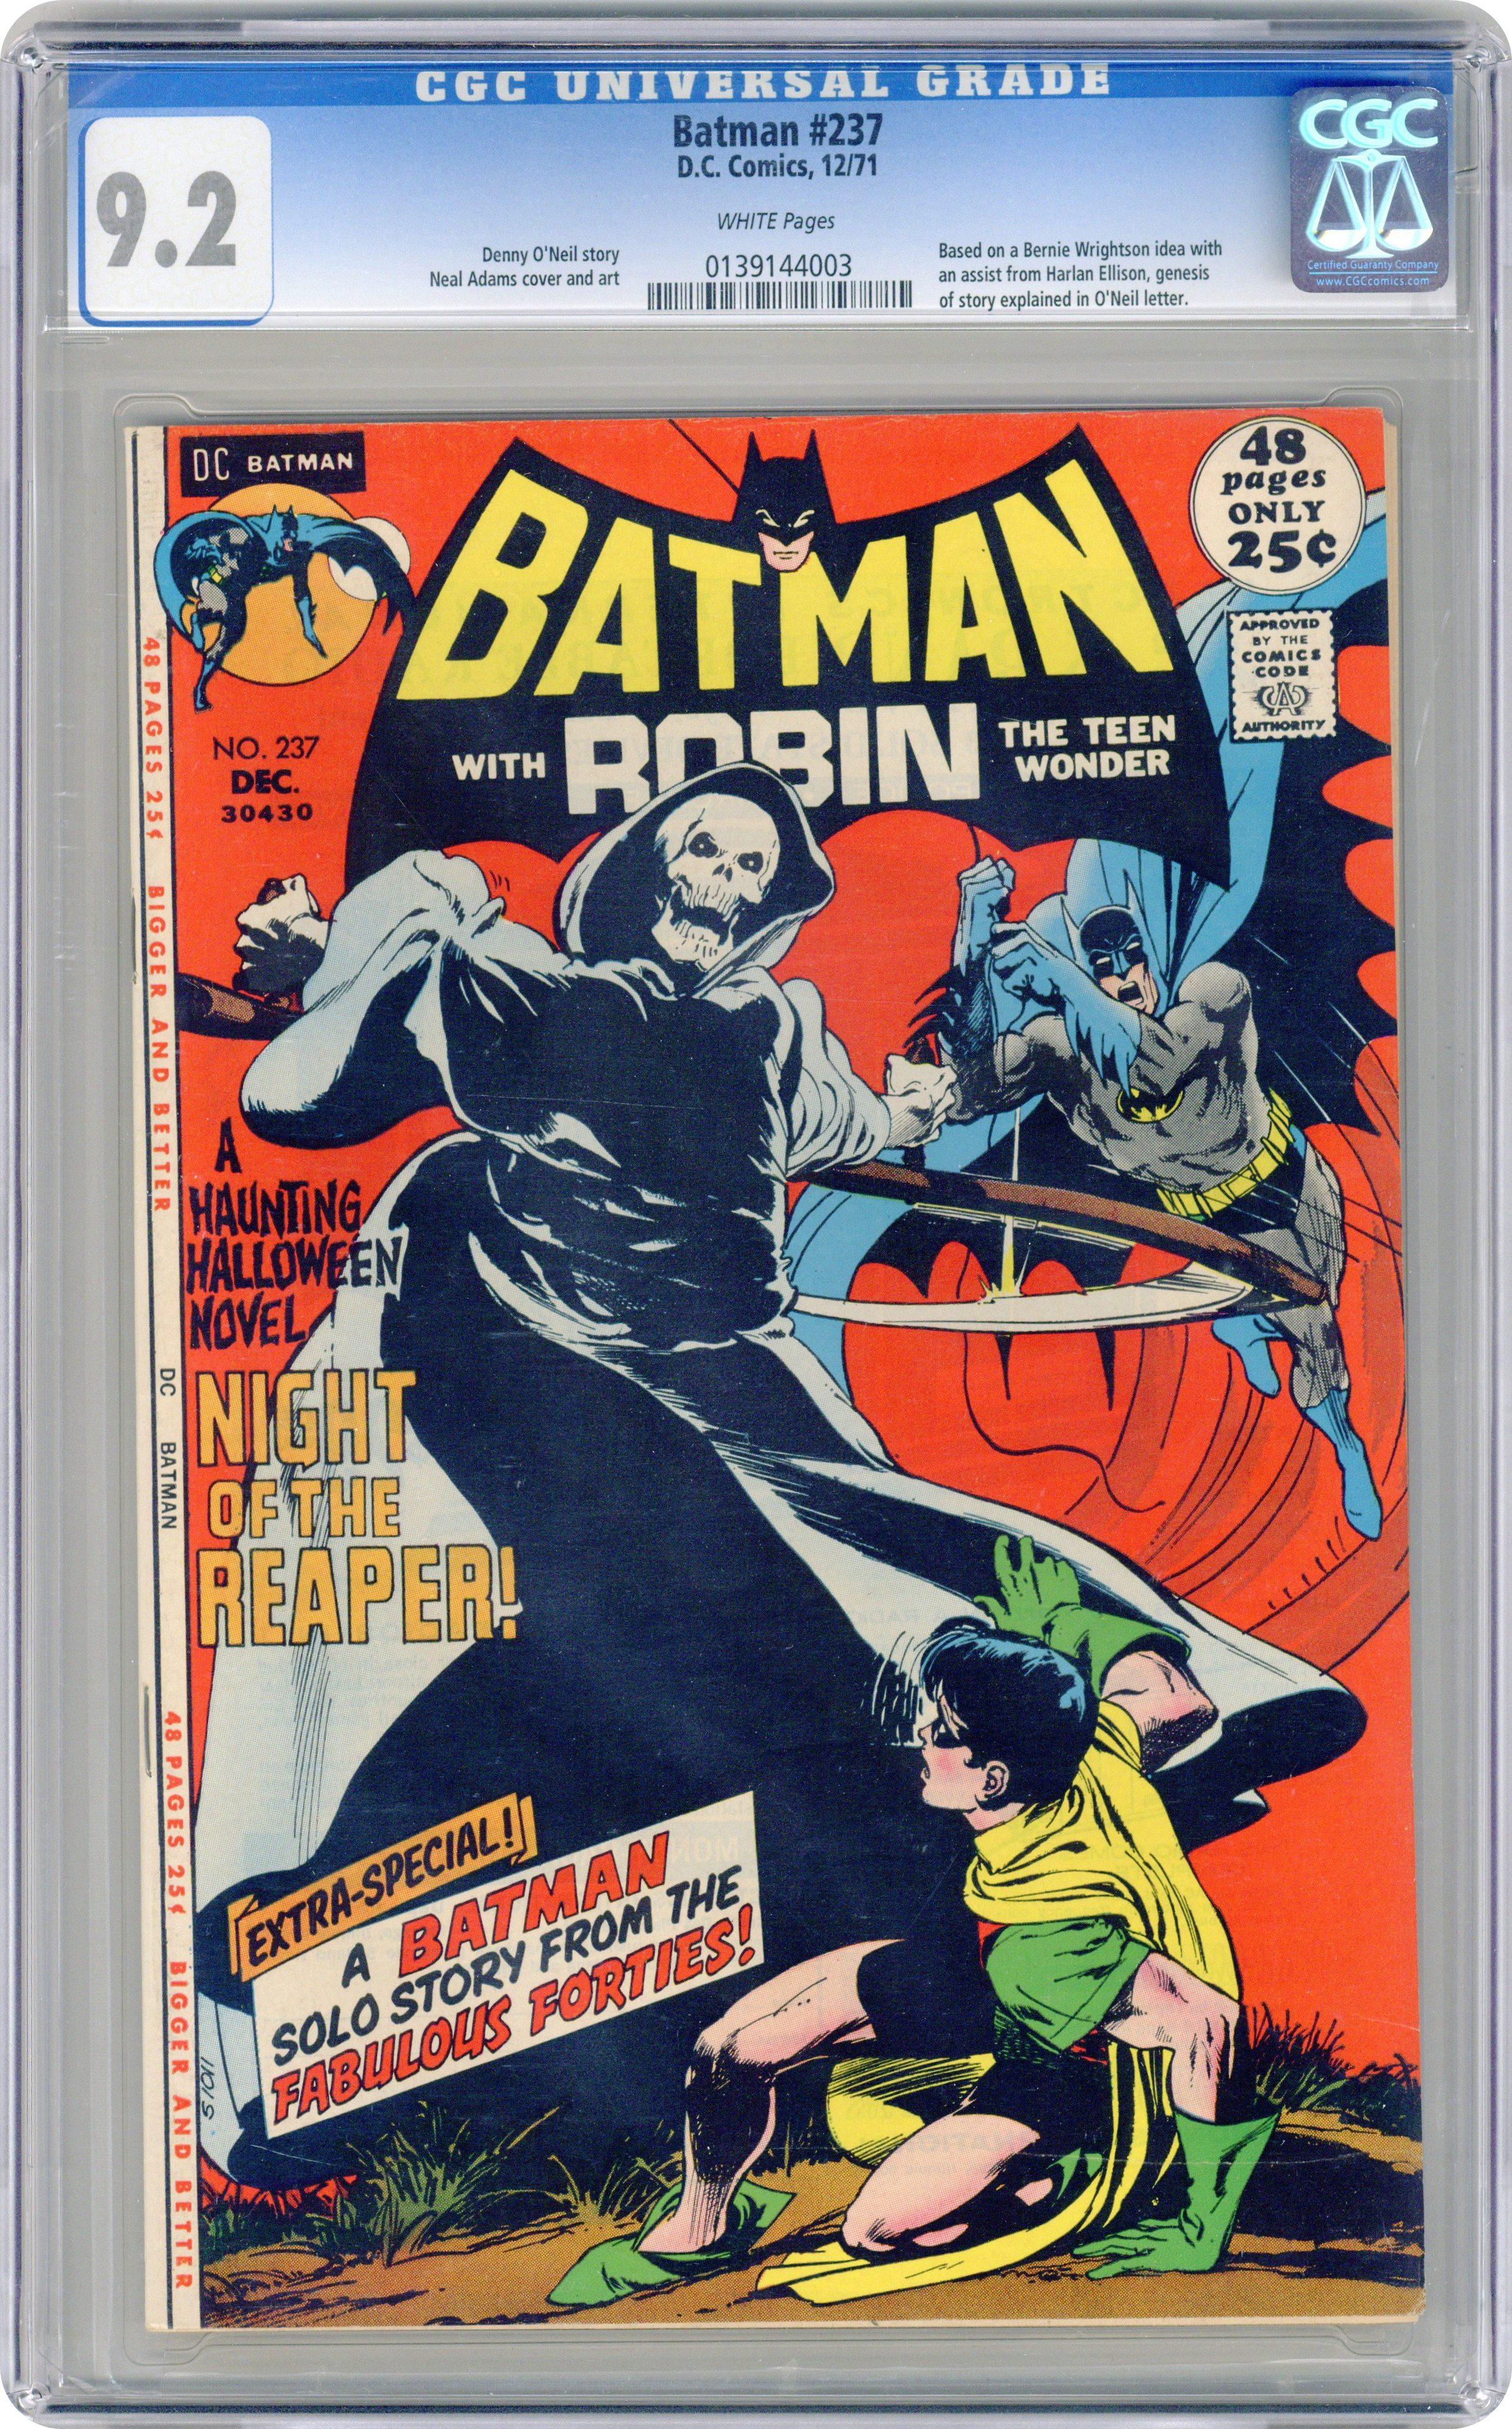 Comic books in 'Grim Reaper', graded by CGC